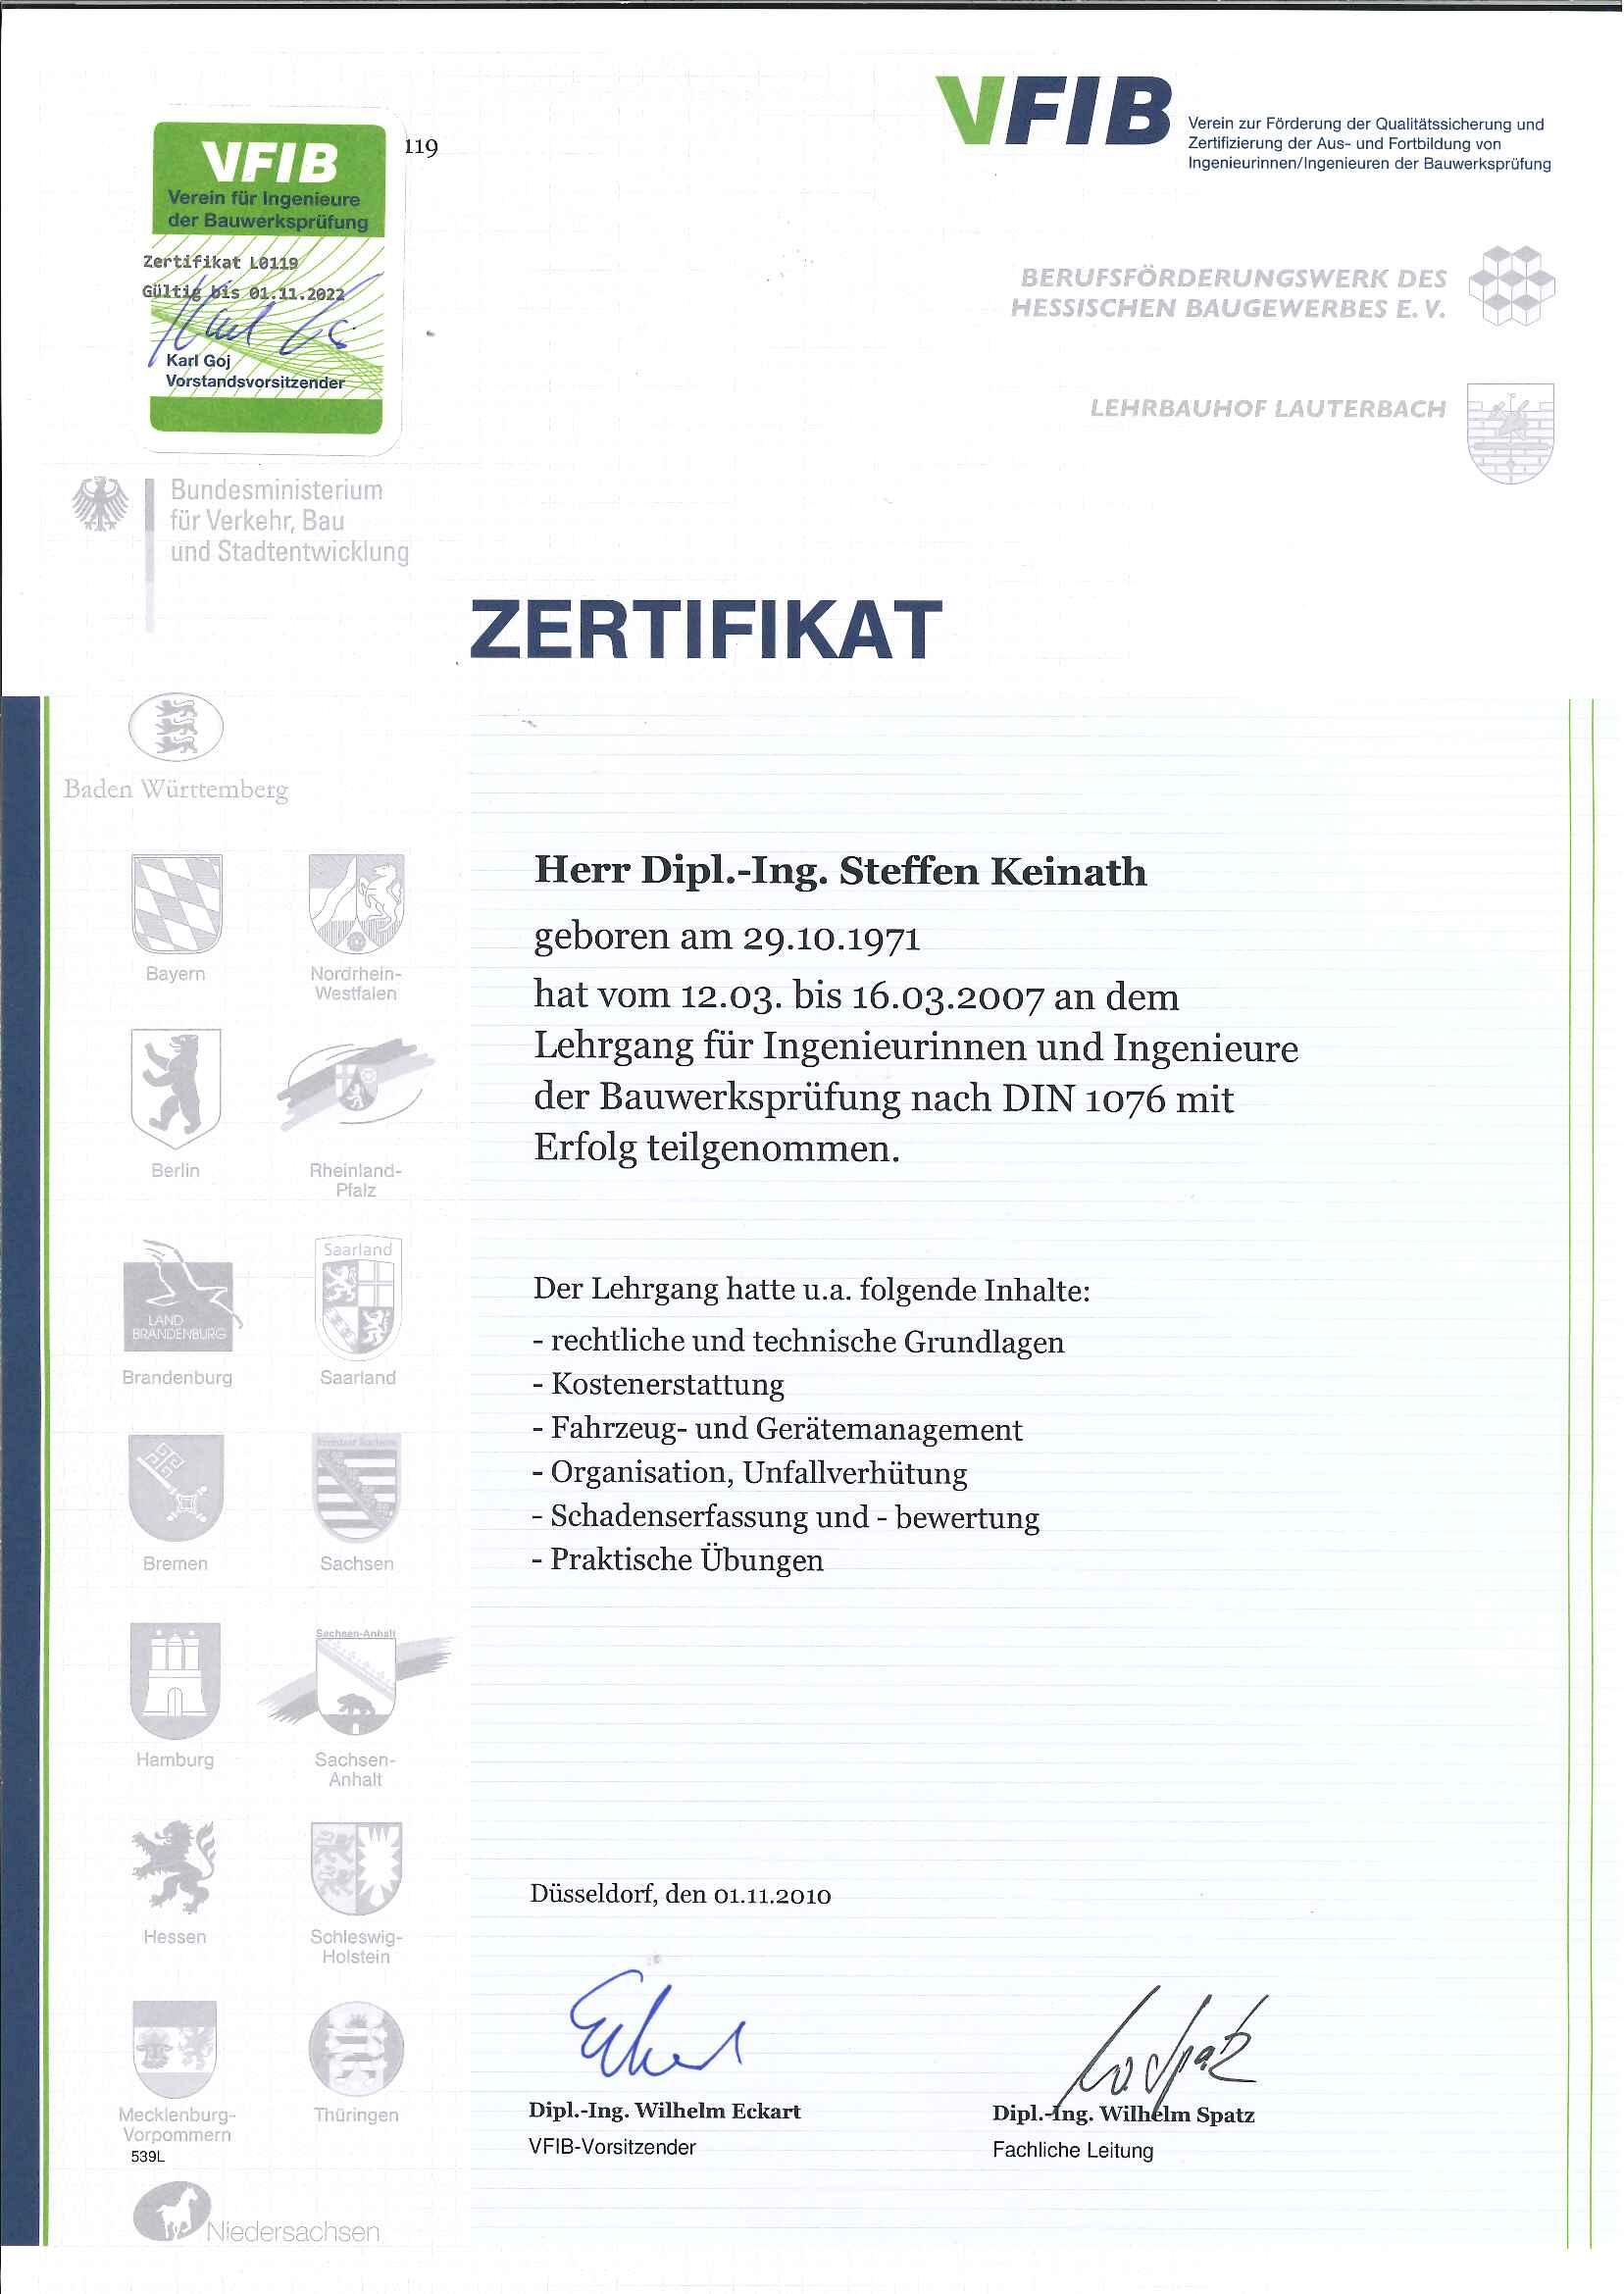 16-06-03_skn_zetifikat_vfib_verlaengerung